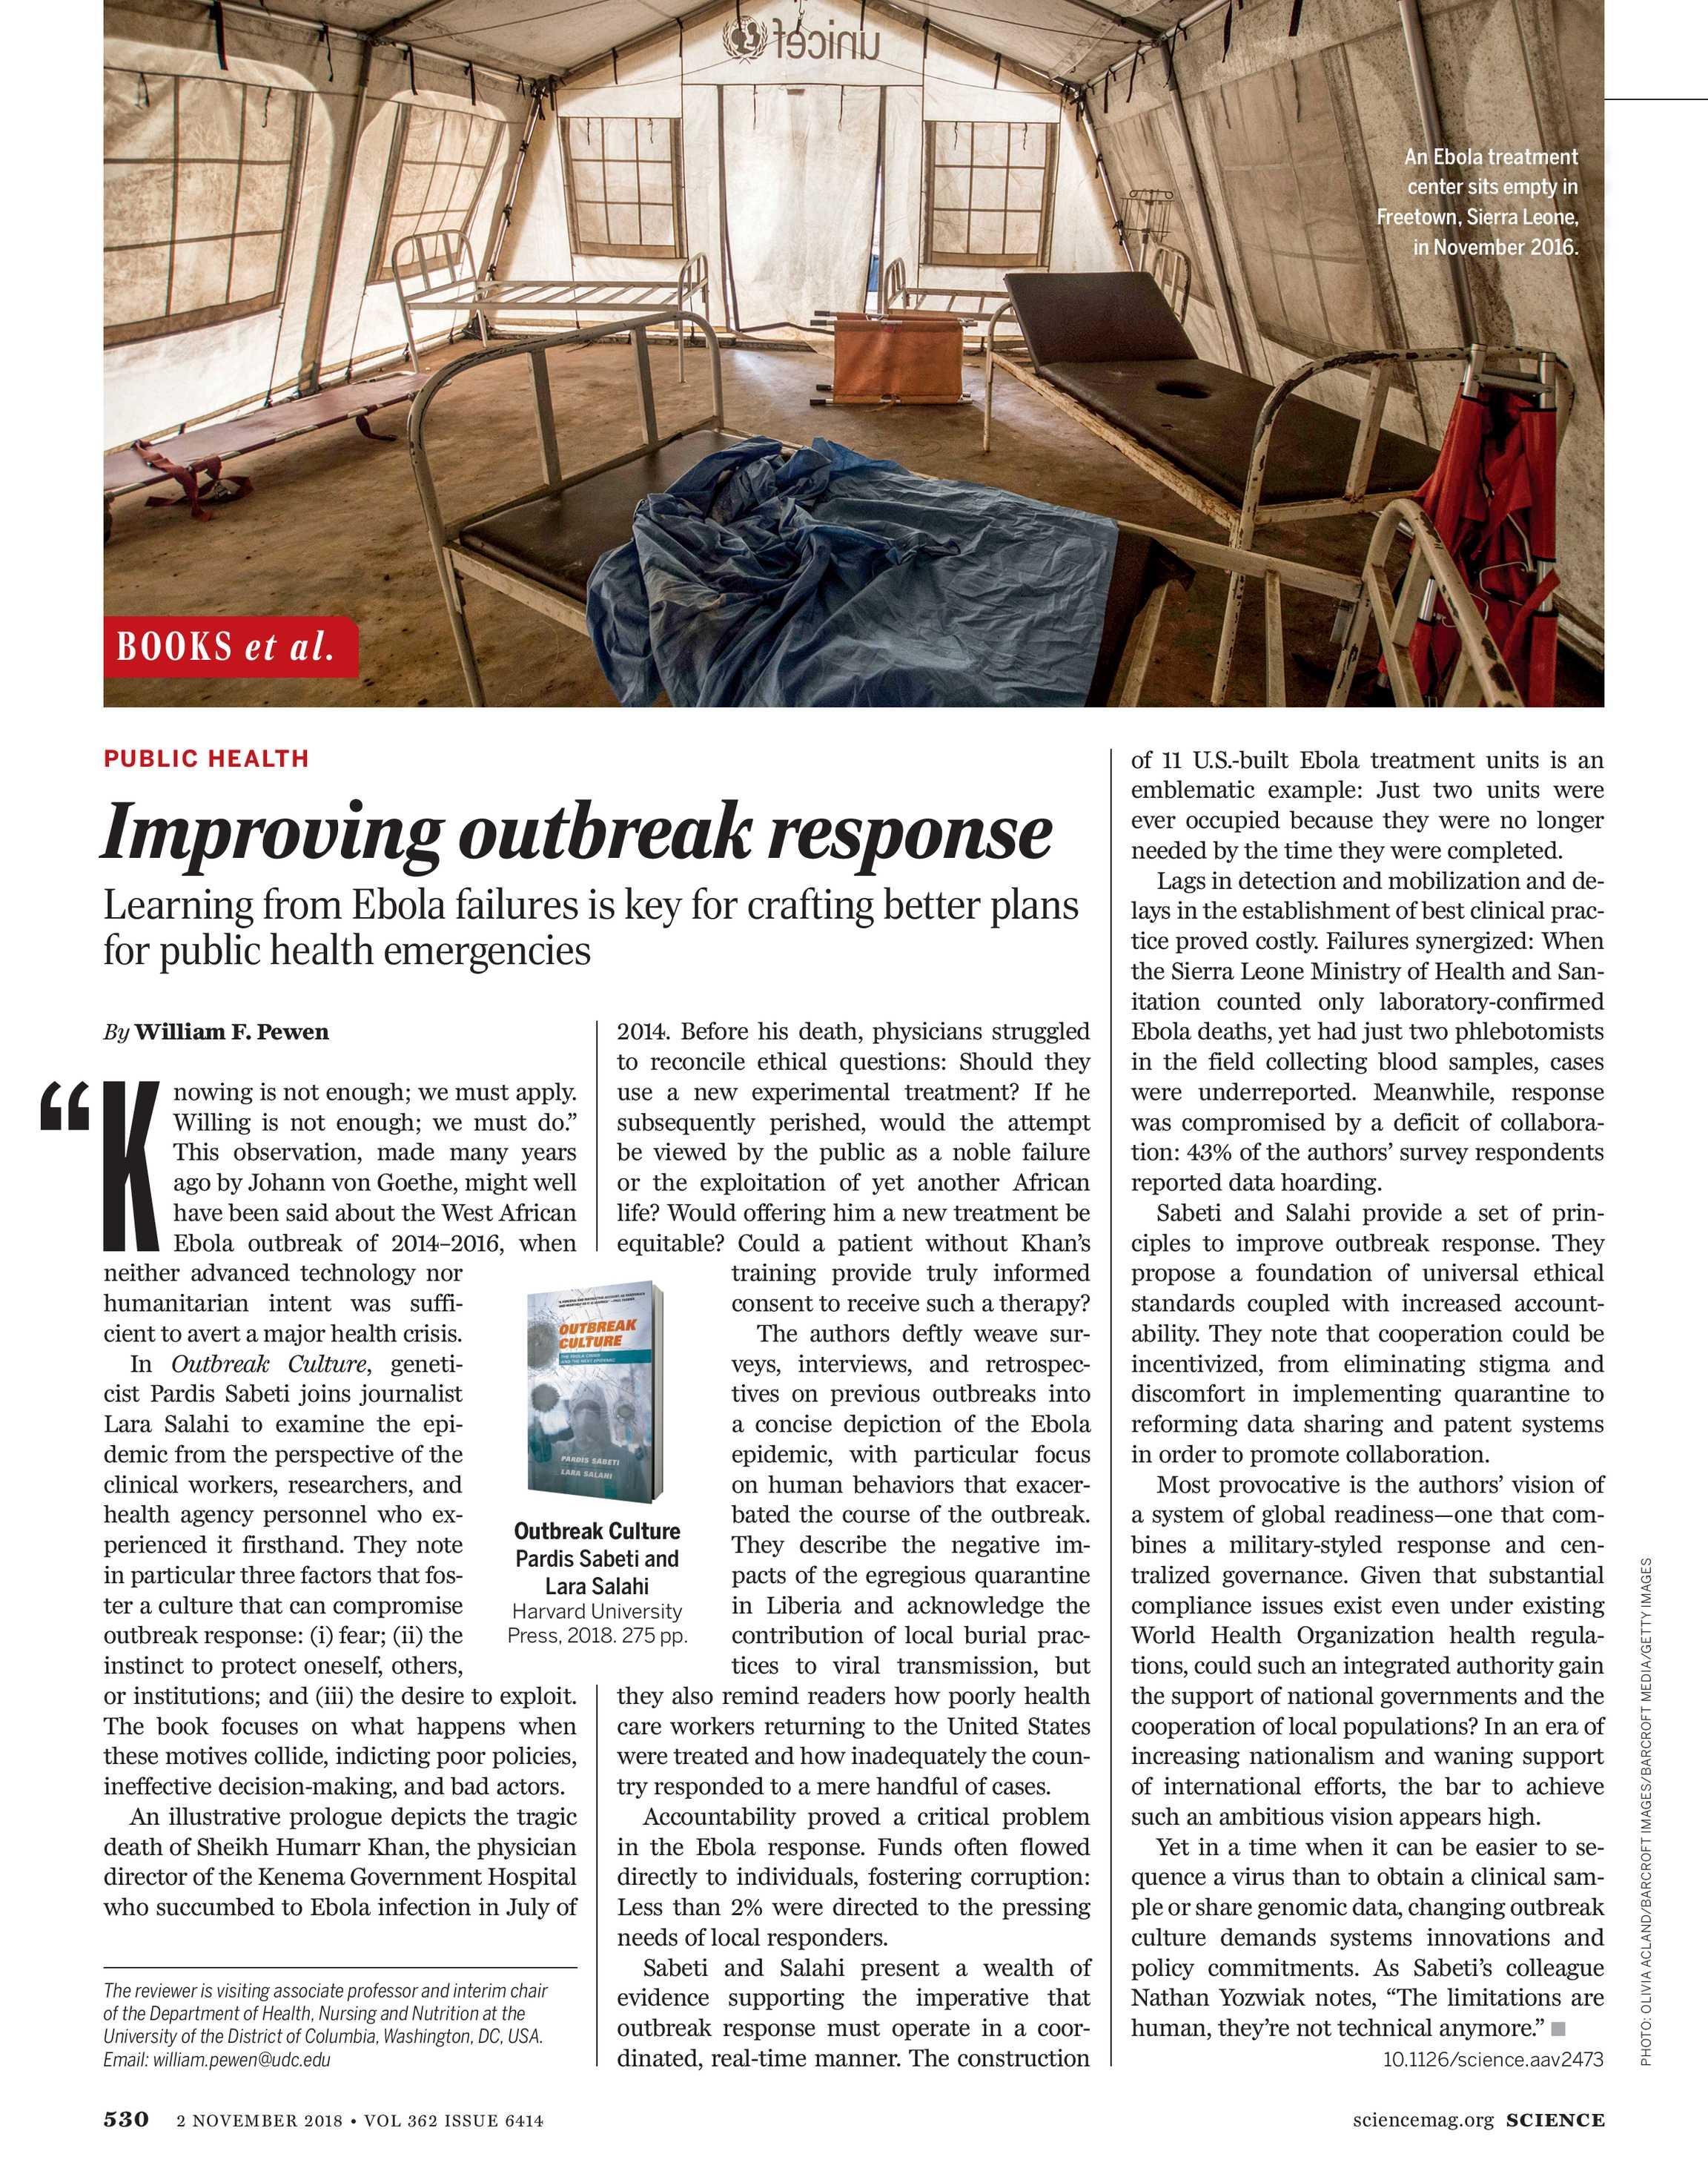 Science Magazine - November 2, 2018 - page 530